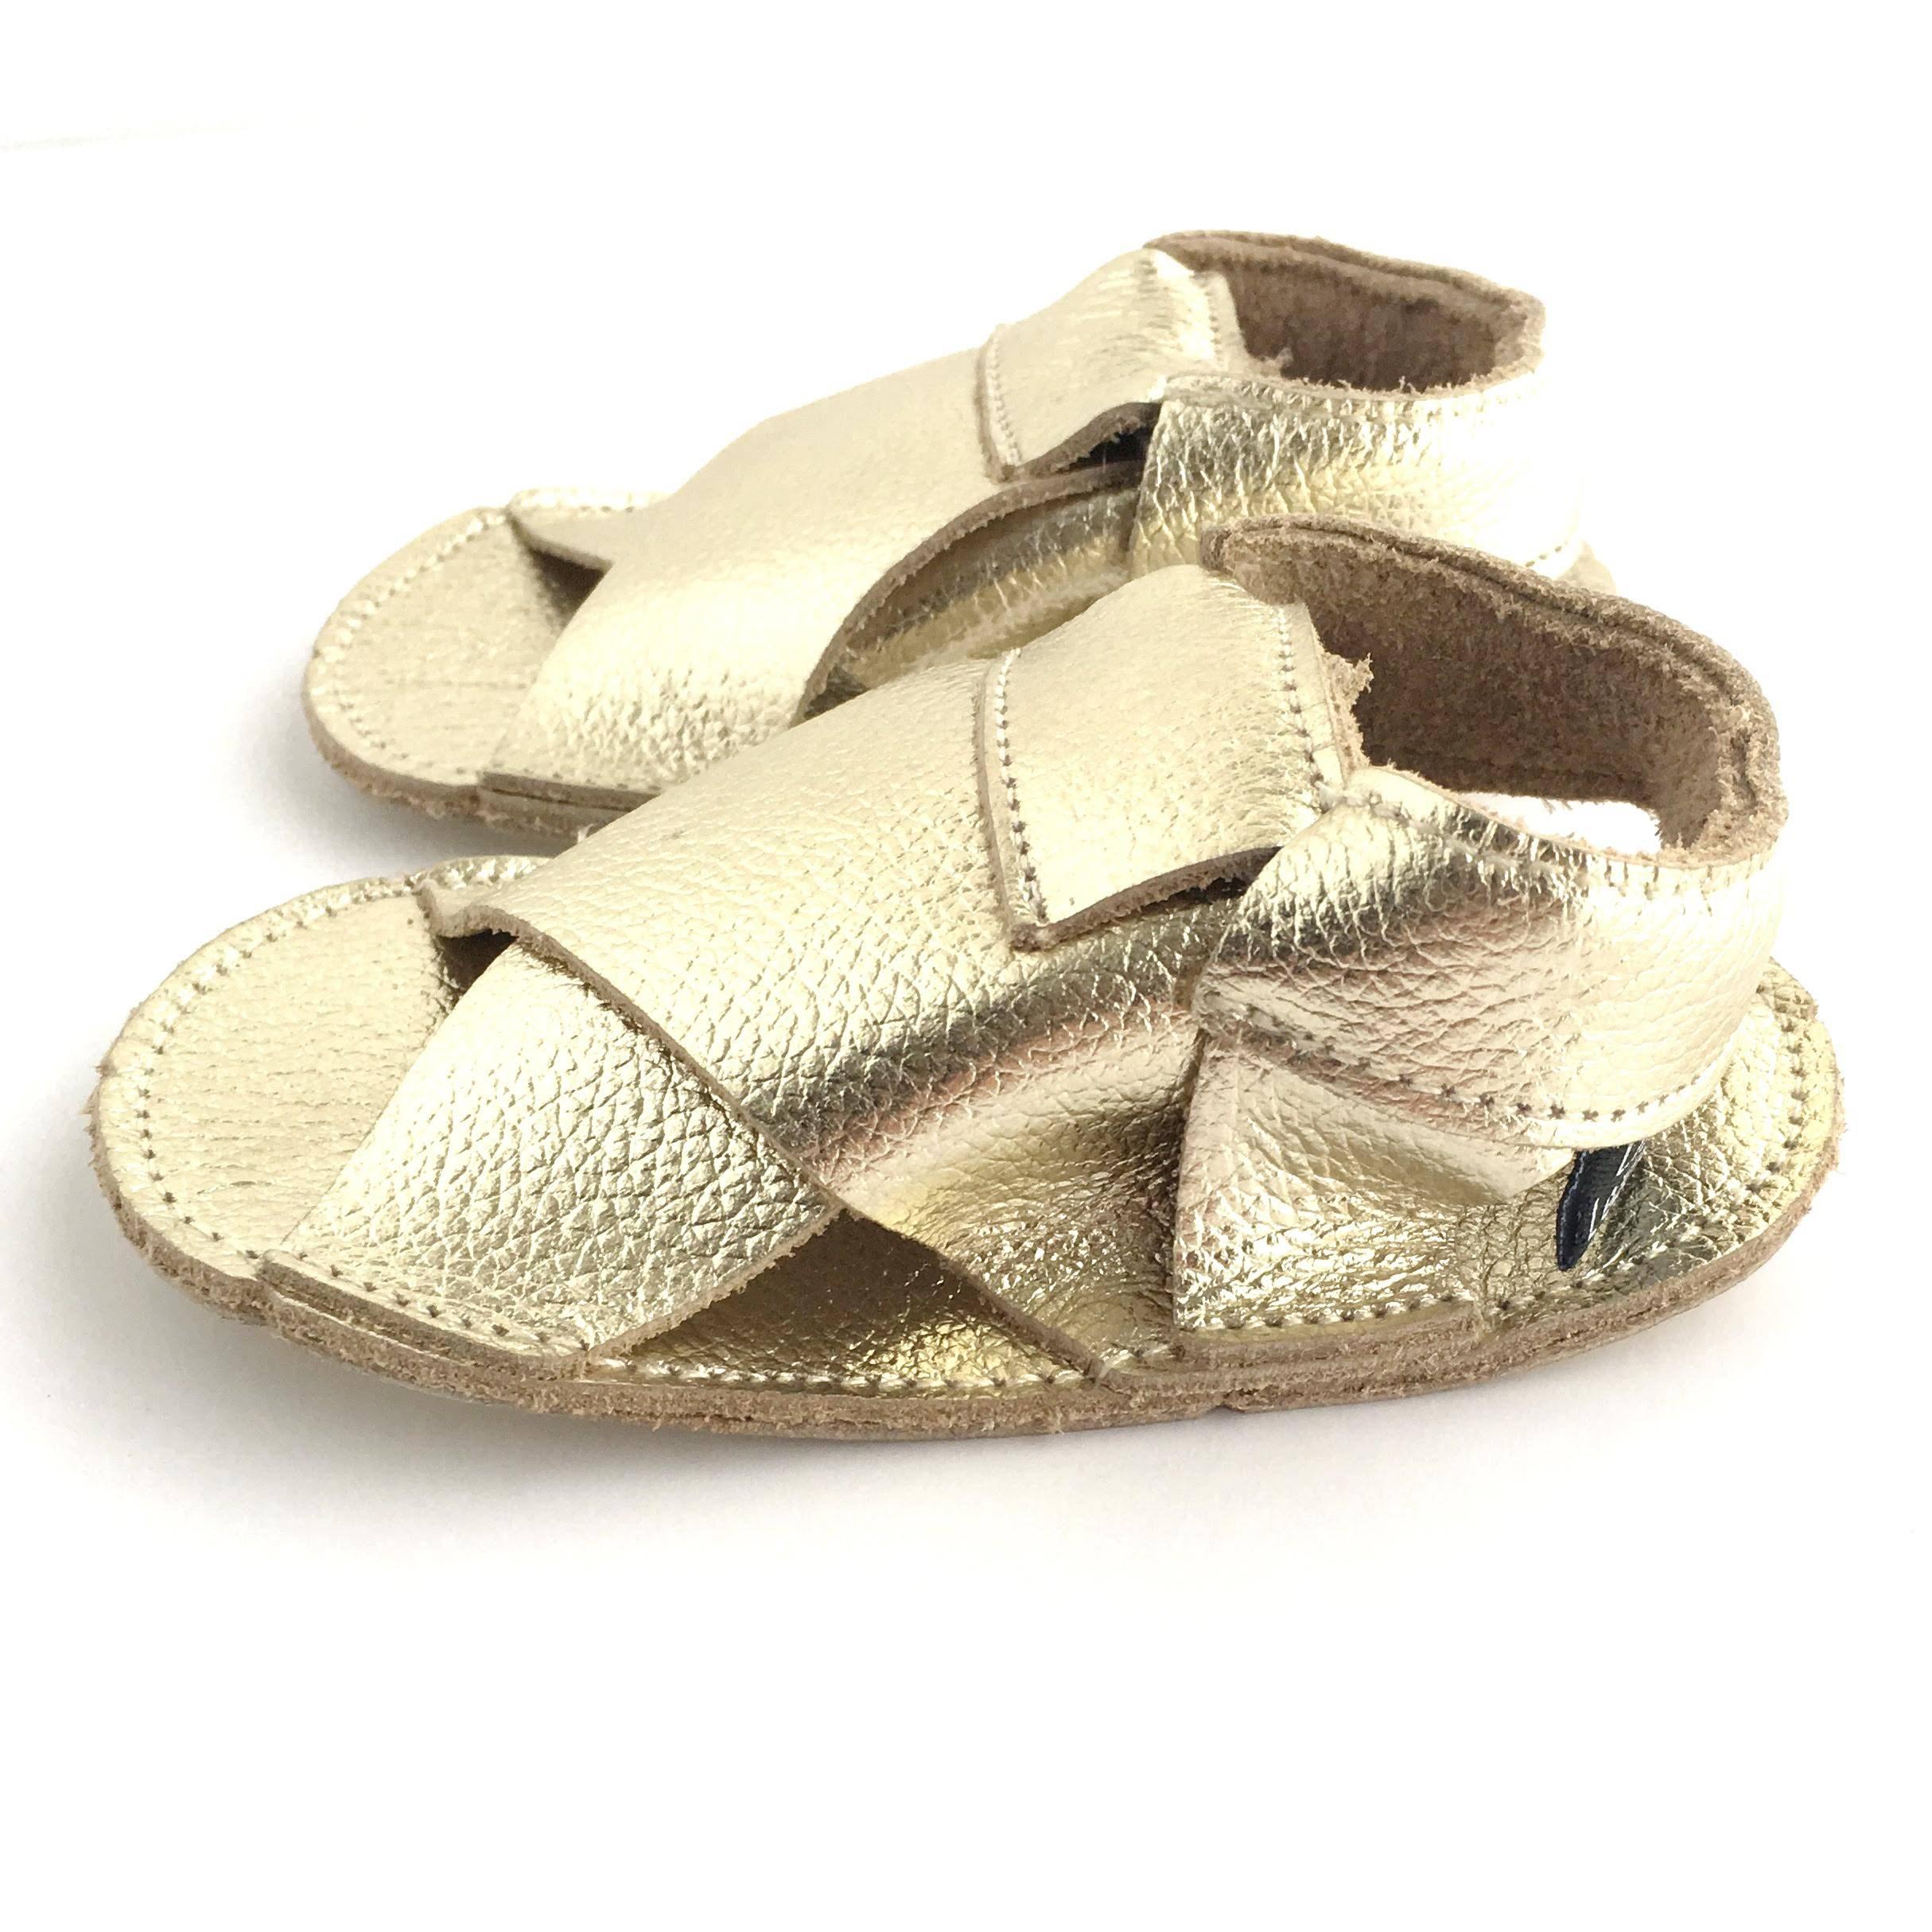 Cross Soft Sole Sandals Metallic Gold Colour Side View